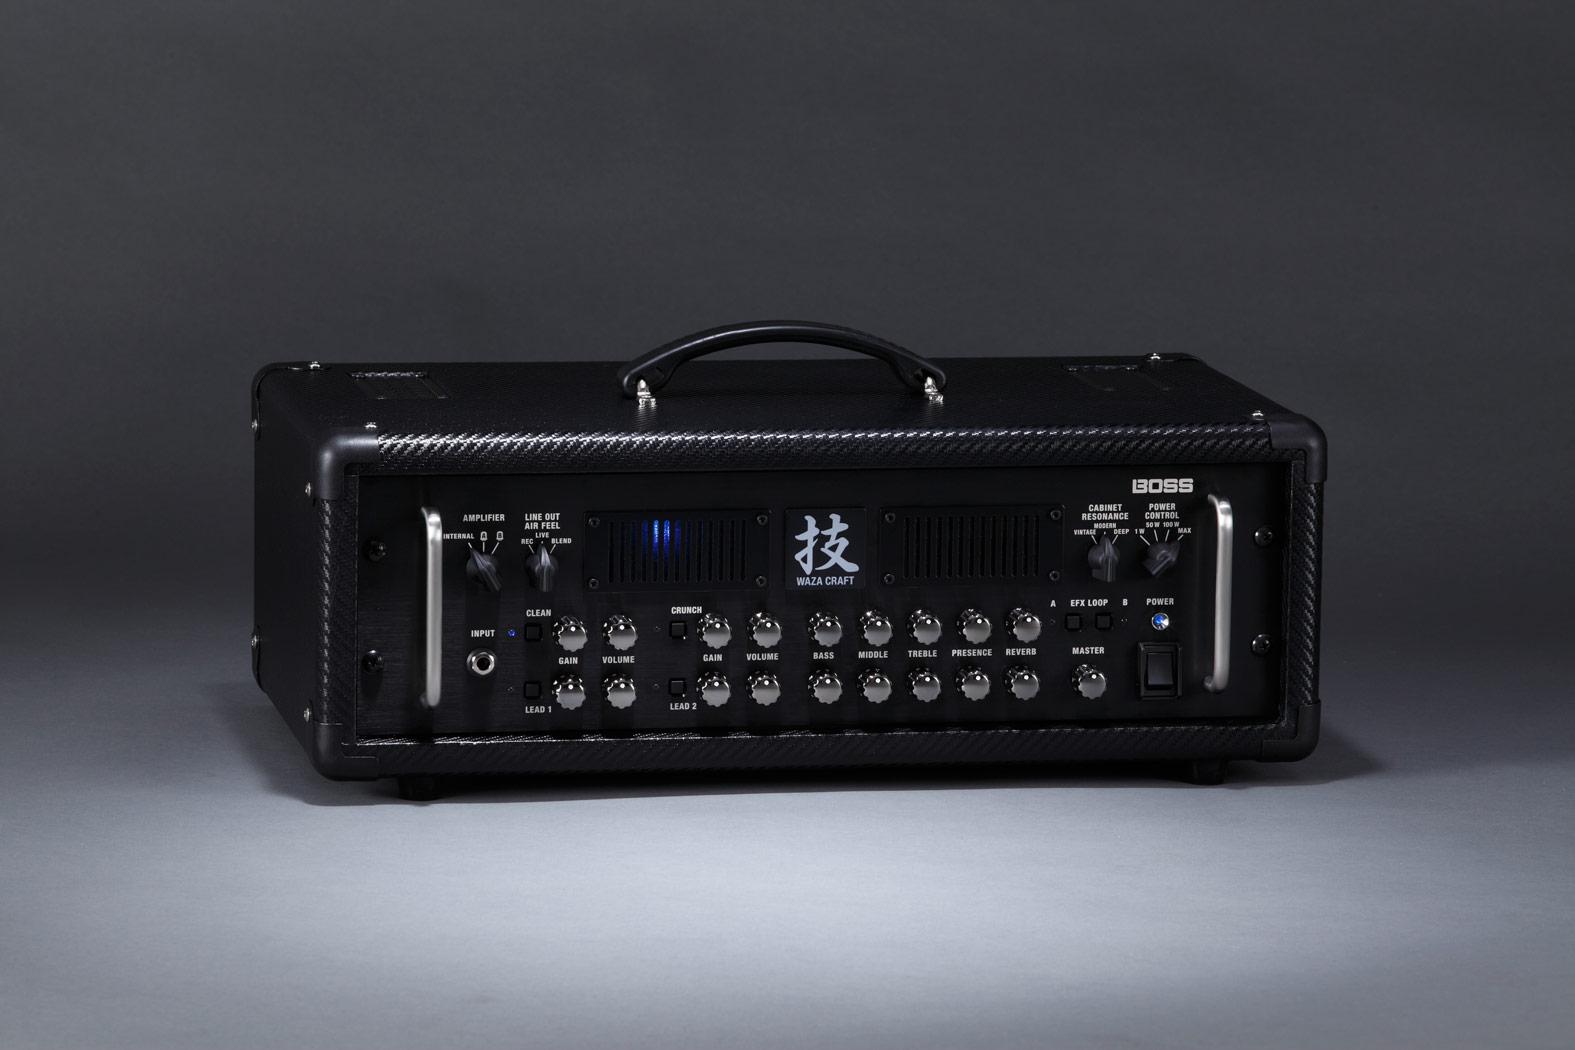 boss waza amp head guitar amplifier. Black Bedroom Furniture Sets. Home Design Ideas